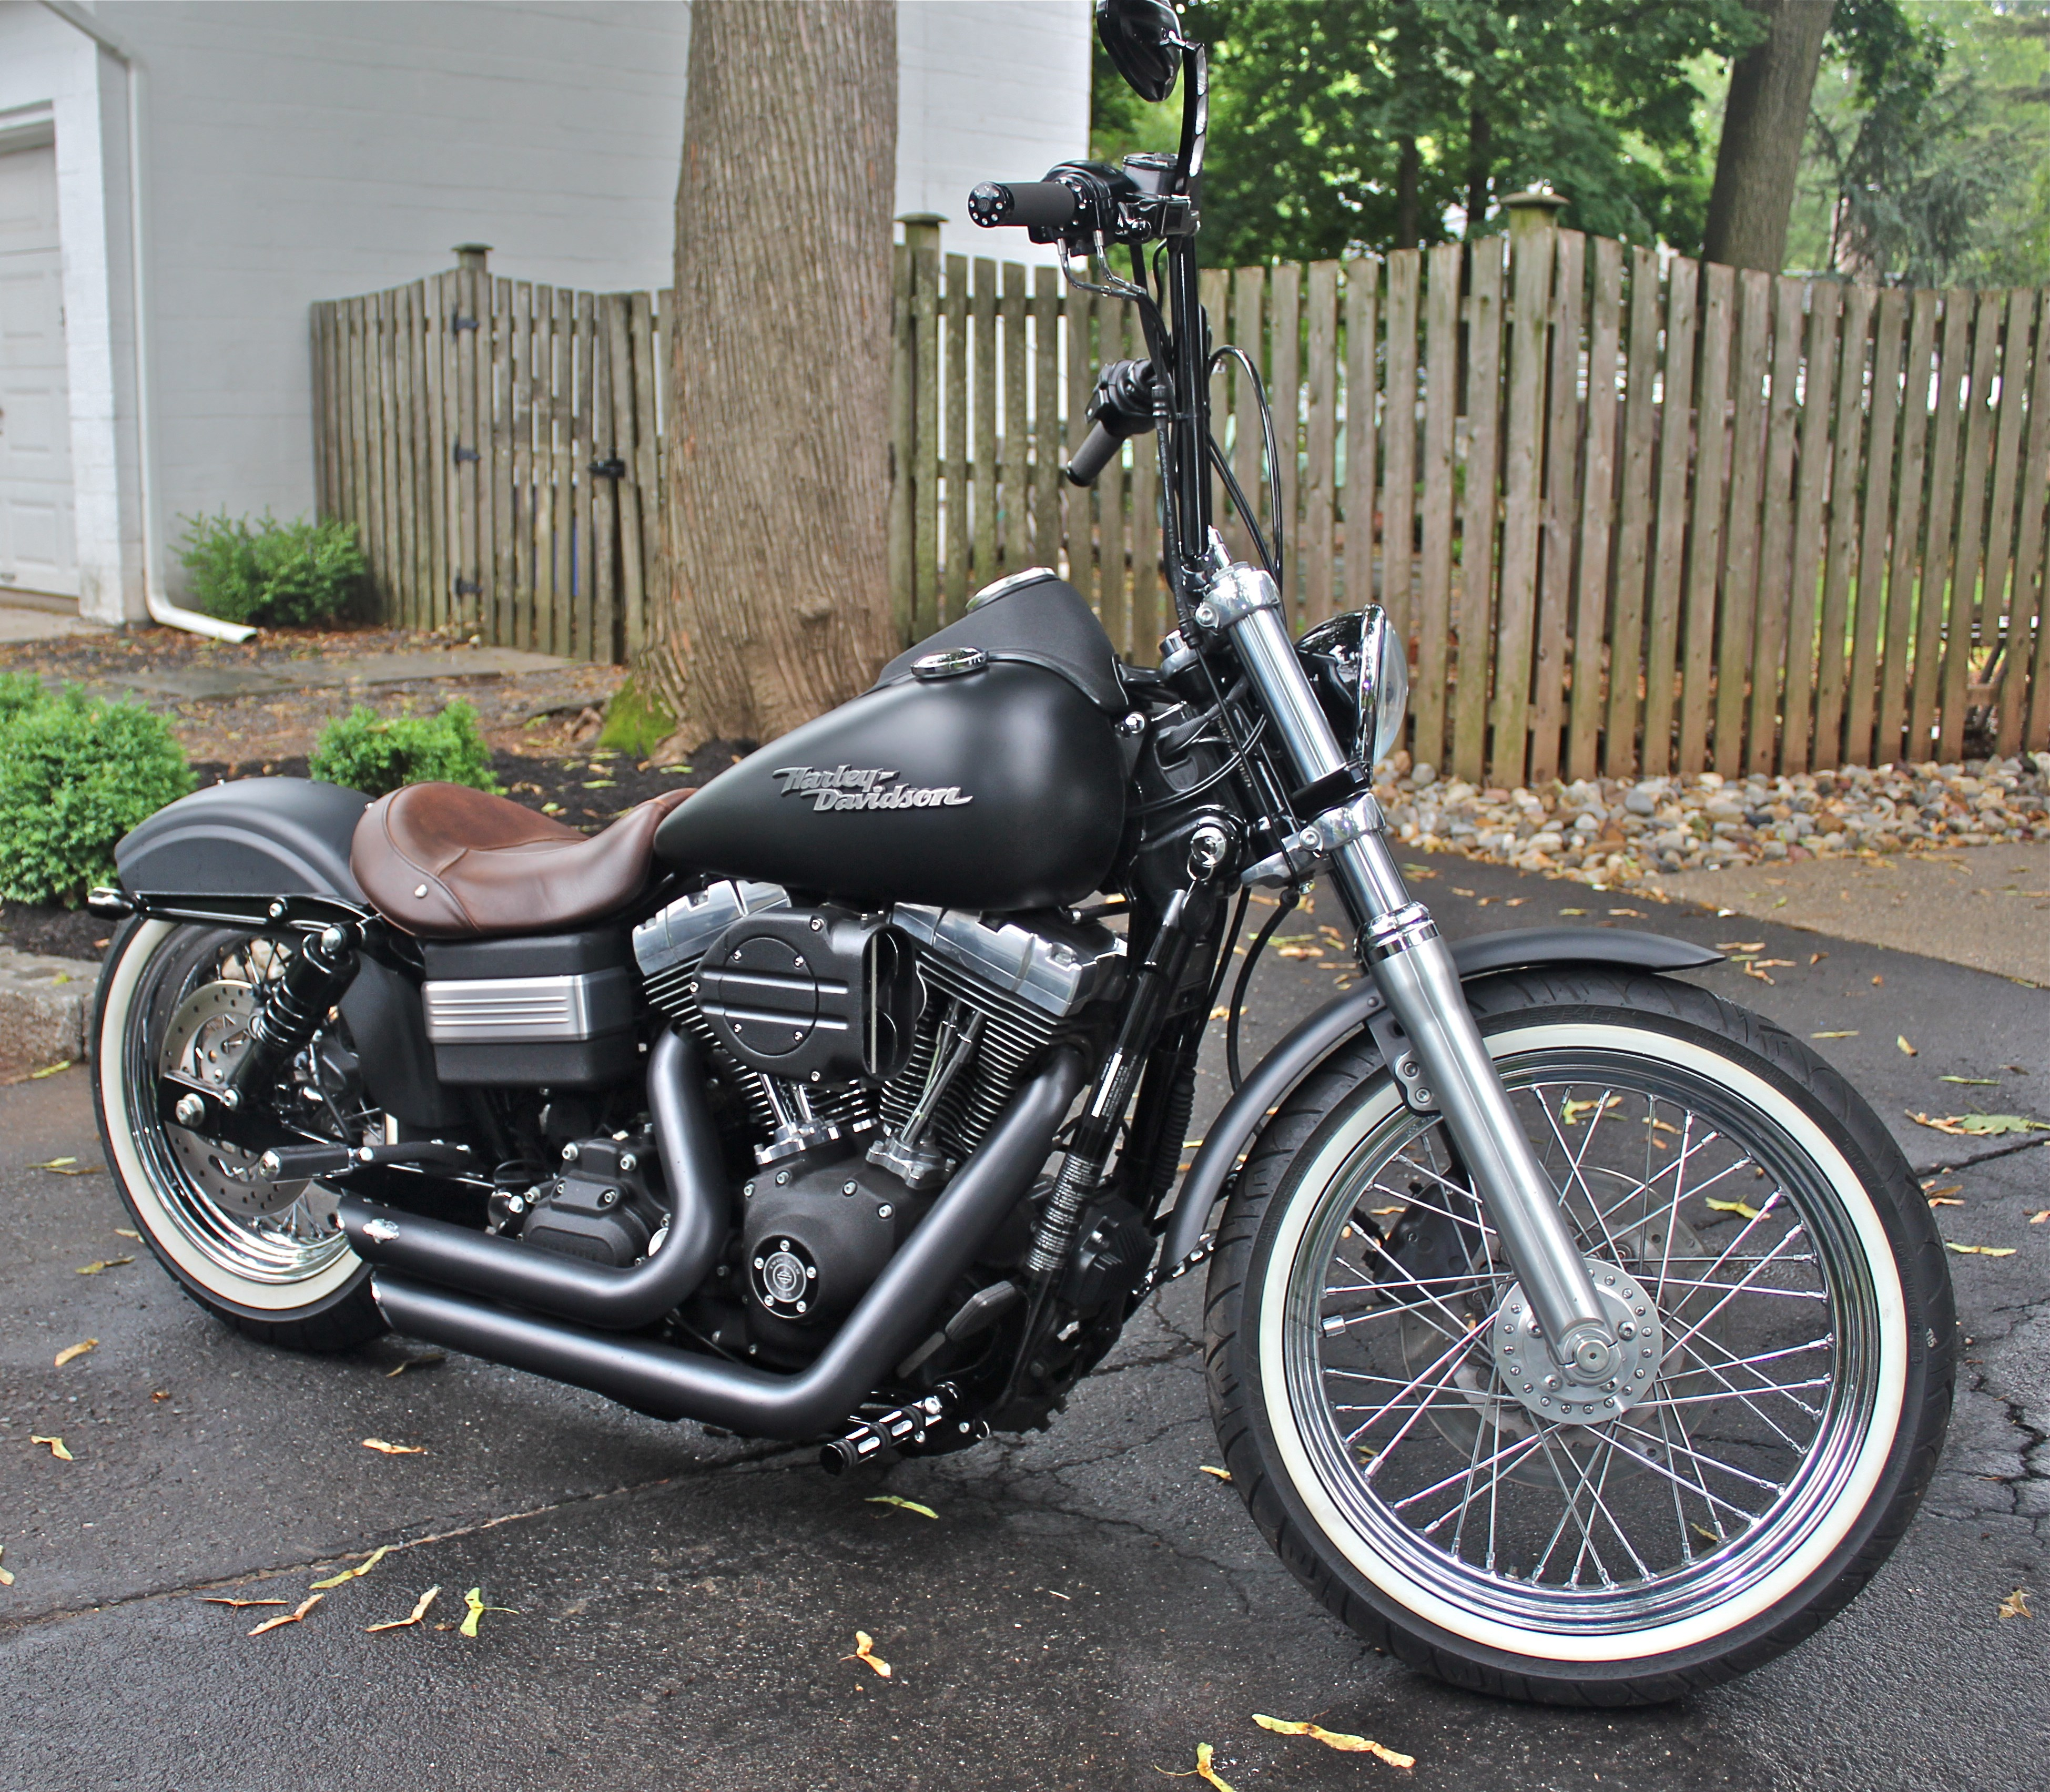 2006 Harley Davidson 174 Fxdb I Dyna 174 Street Bob 174 Matte